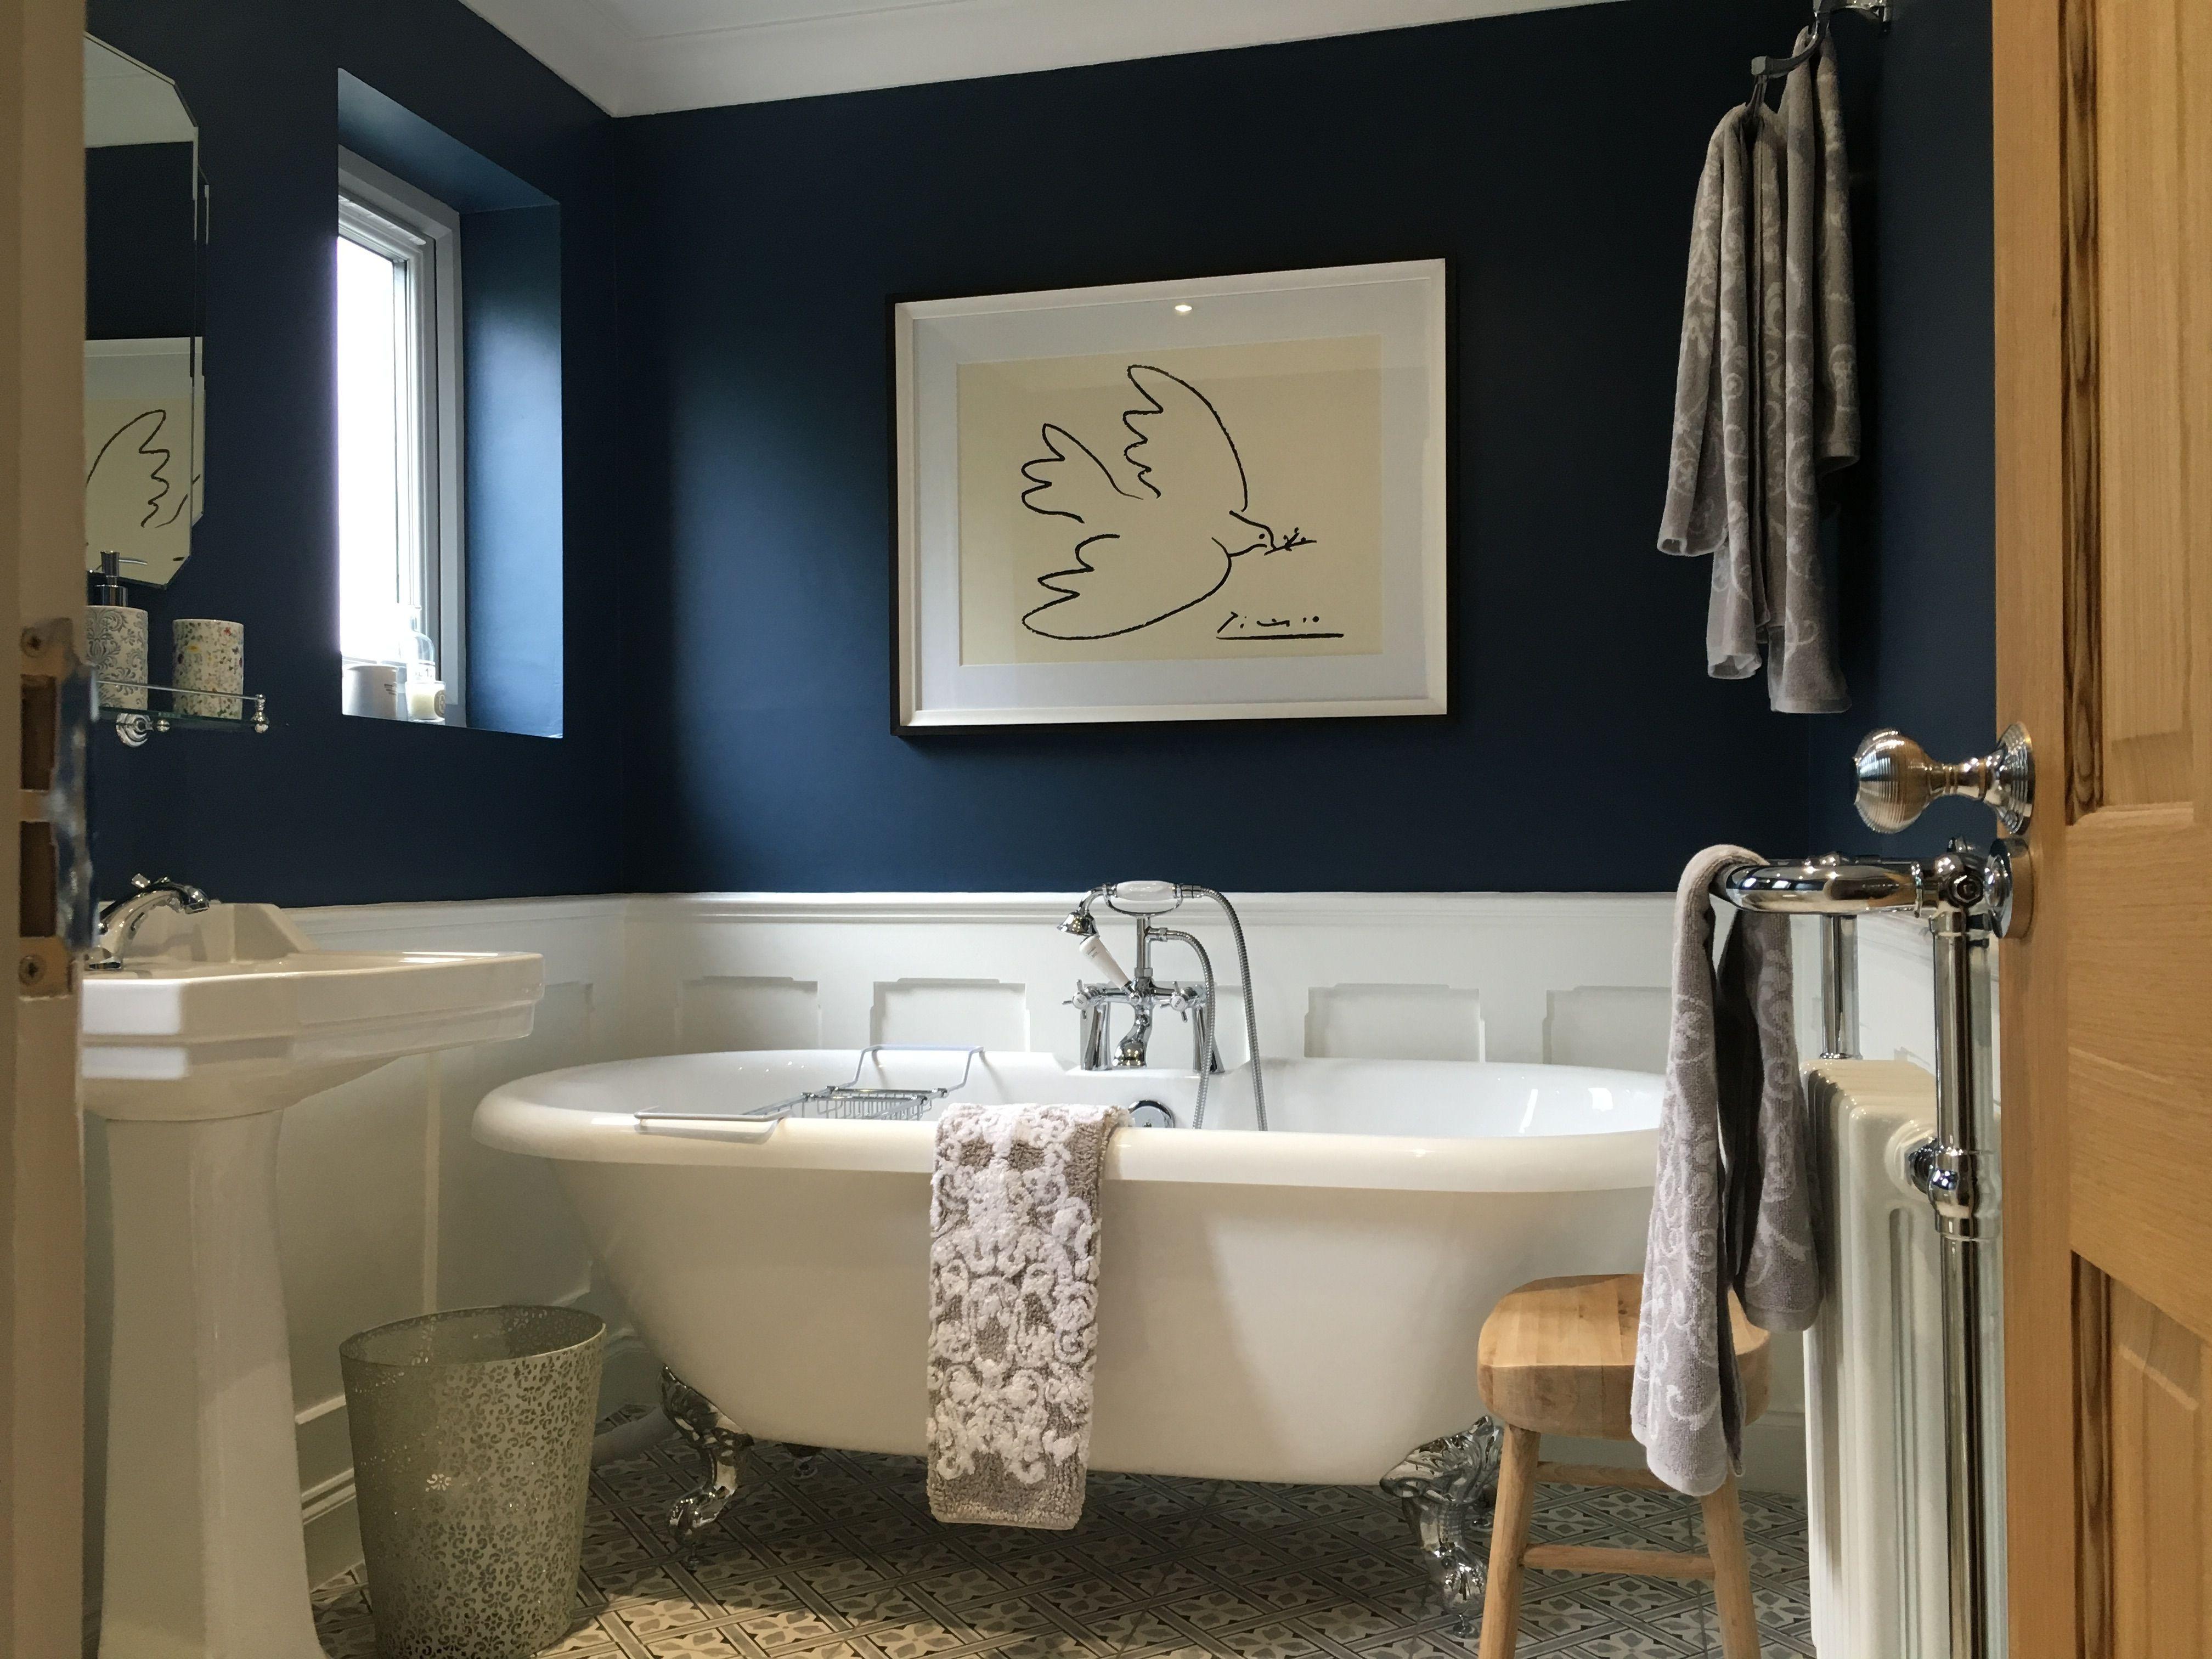 Shell Bathroom Decor Baby Blue Accessories Beach Themed L Home